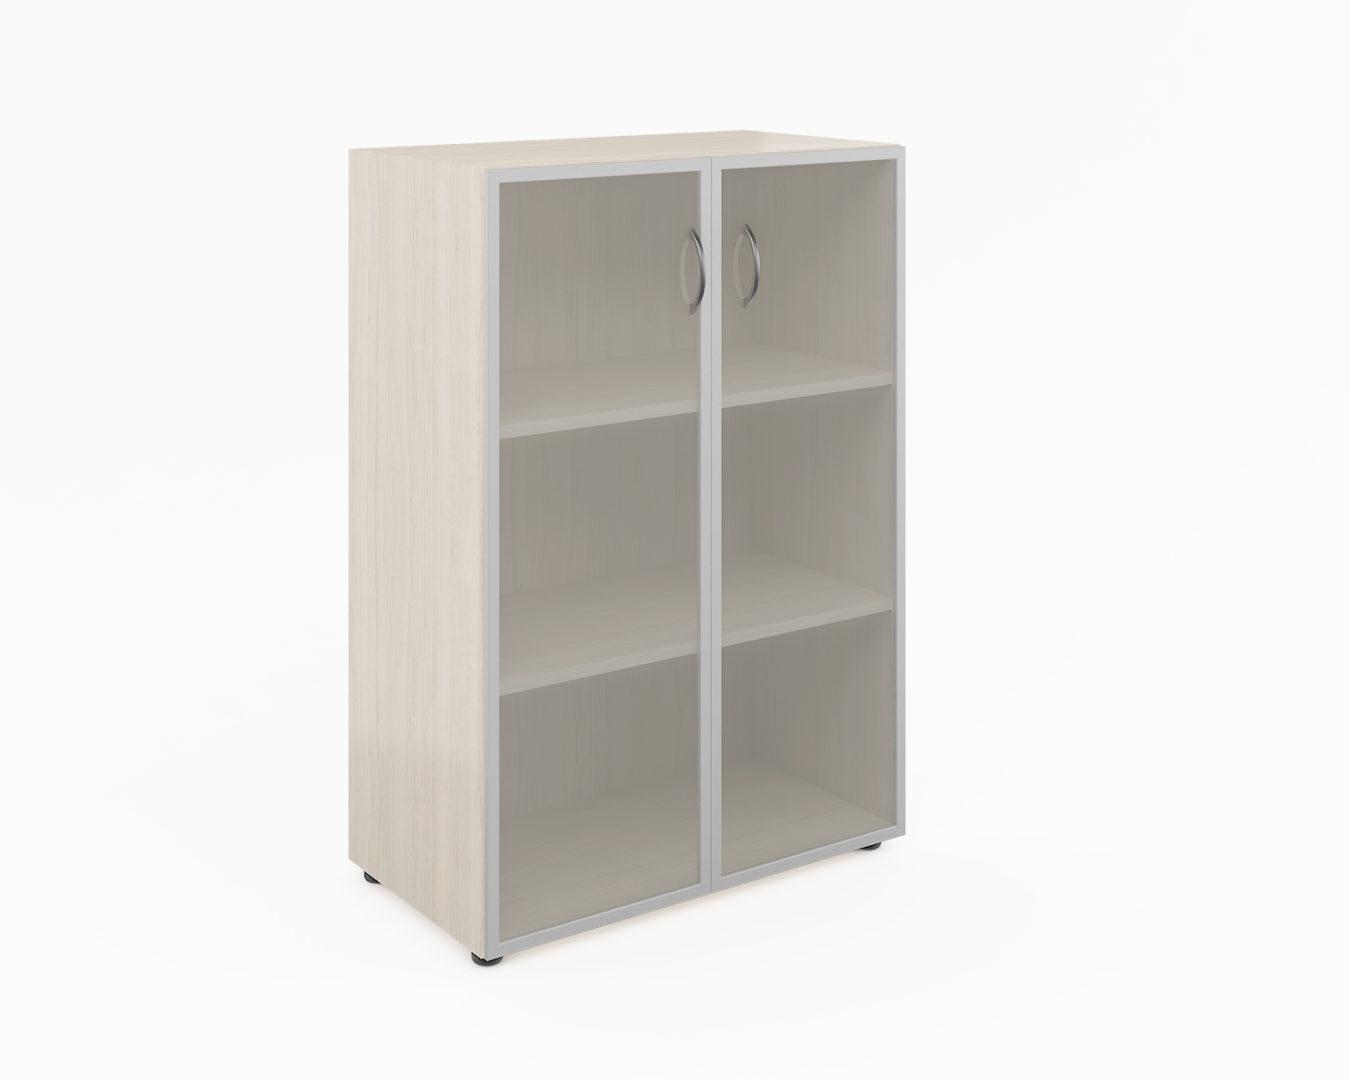 Шкаф широкий средний со стеклом в алюм. раме (без топа)  ФР-5.0+S60.0*2+С504*2